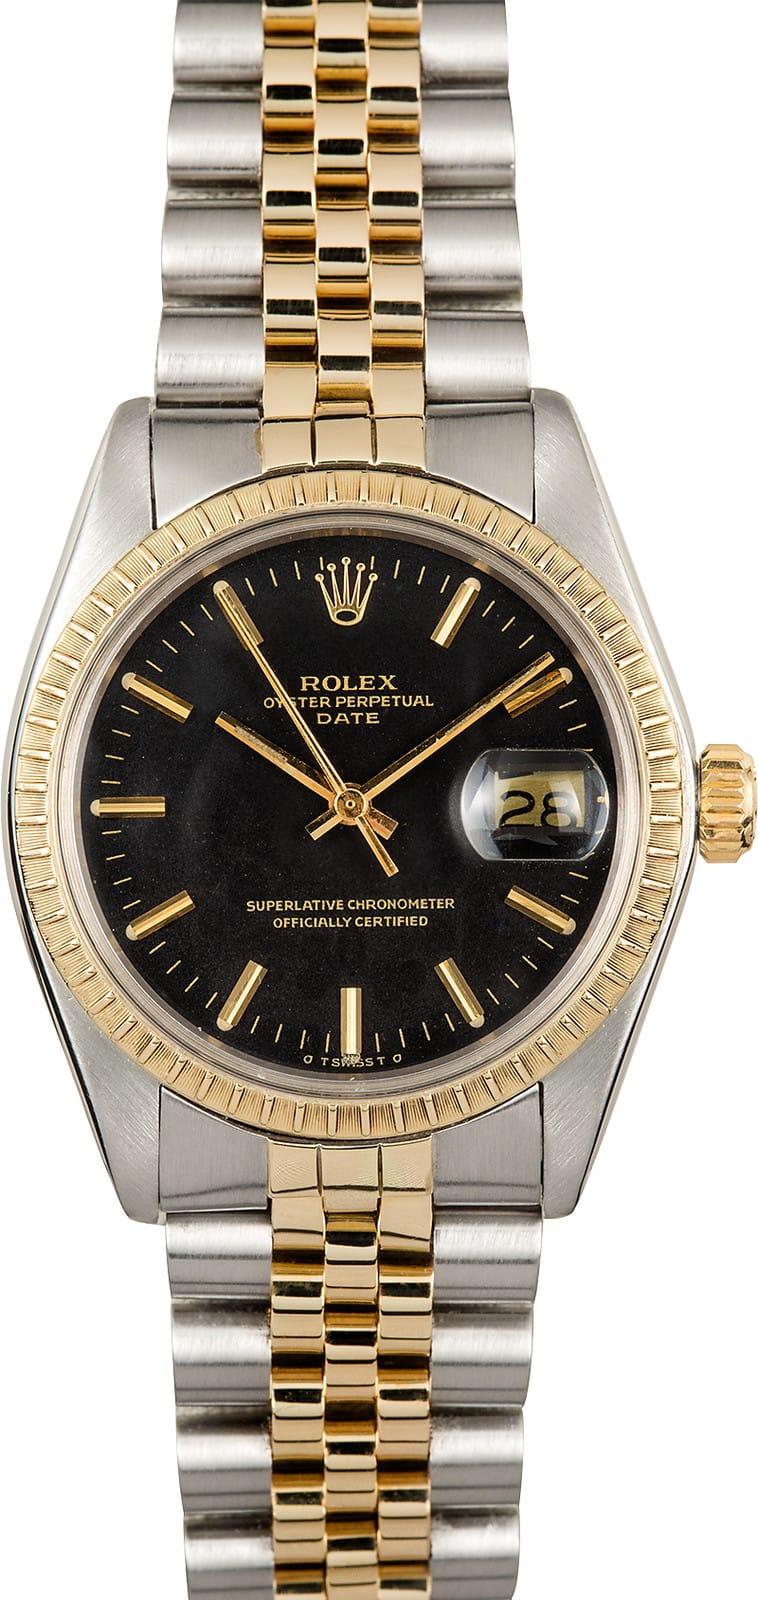 Rolex Date 1500 Two Tone